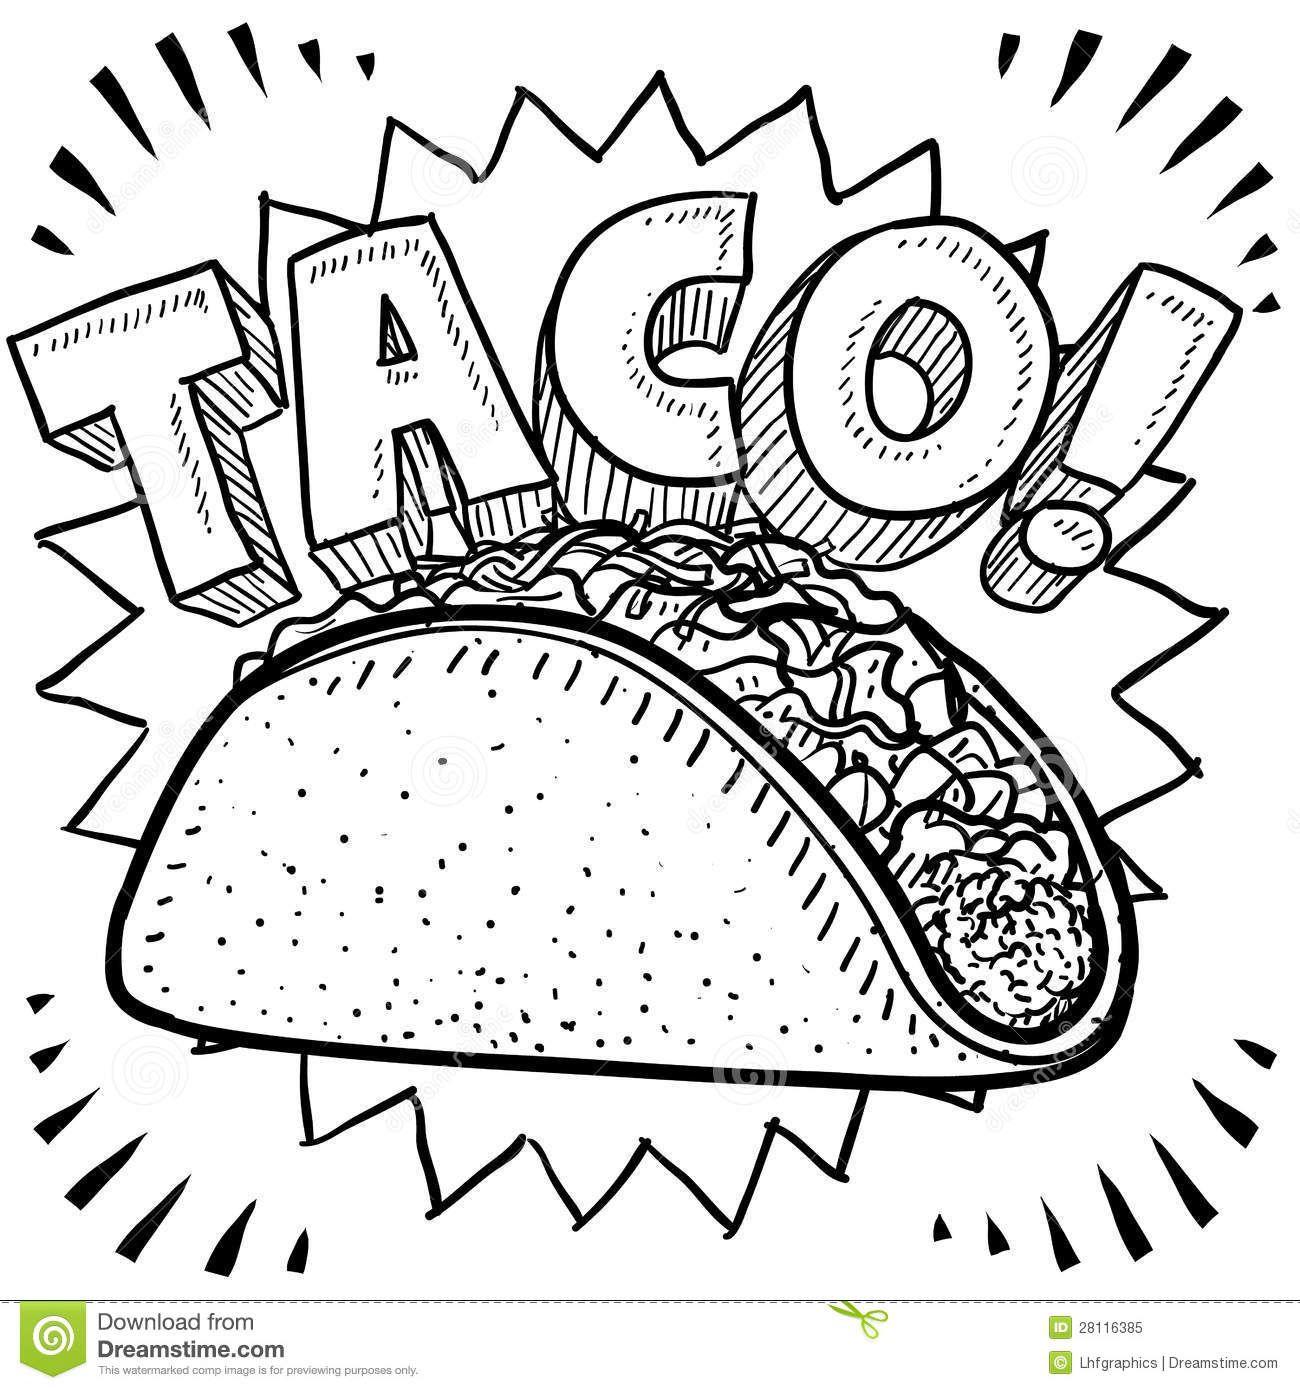 Download taco-sketch-28116385.jpg (1300×1390) | Taco drawing, Food ...